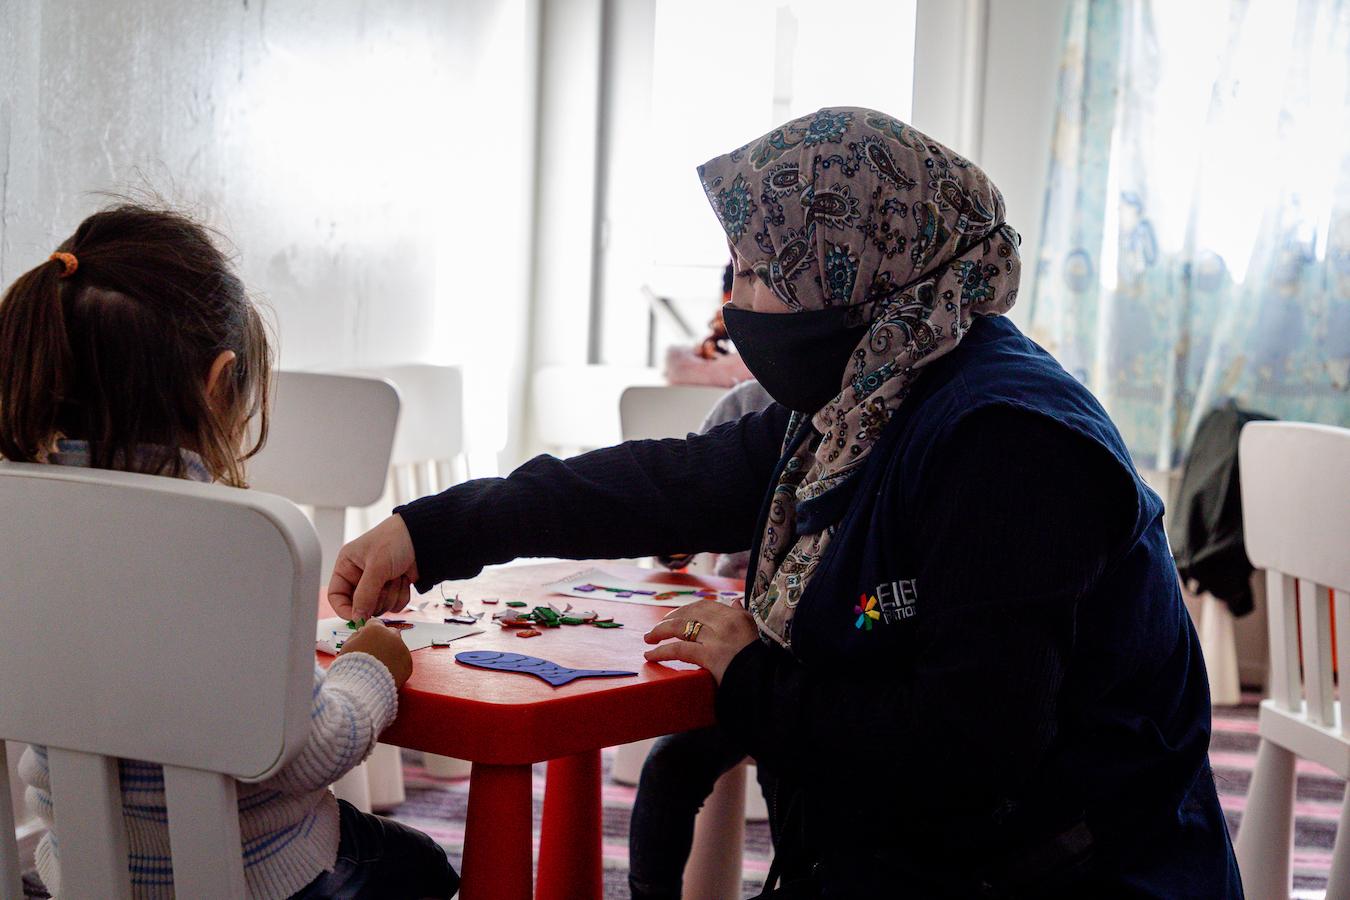 Suzan-teaching-ECD-Azraq-Camp-center-children-Arabic-letters-and-her-daughter-Sham-next-to-her-11.jpg